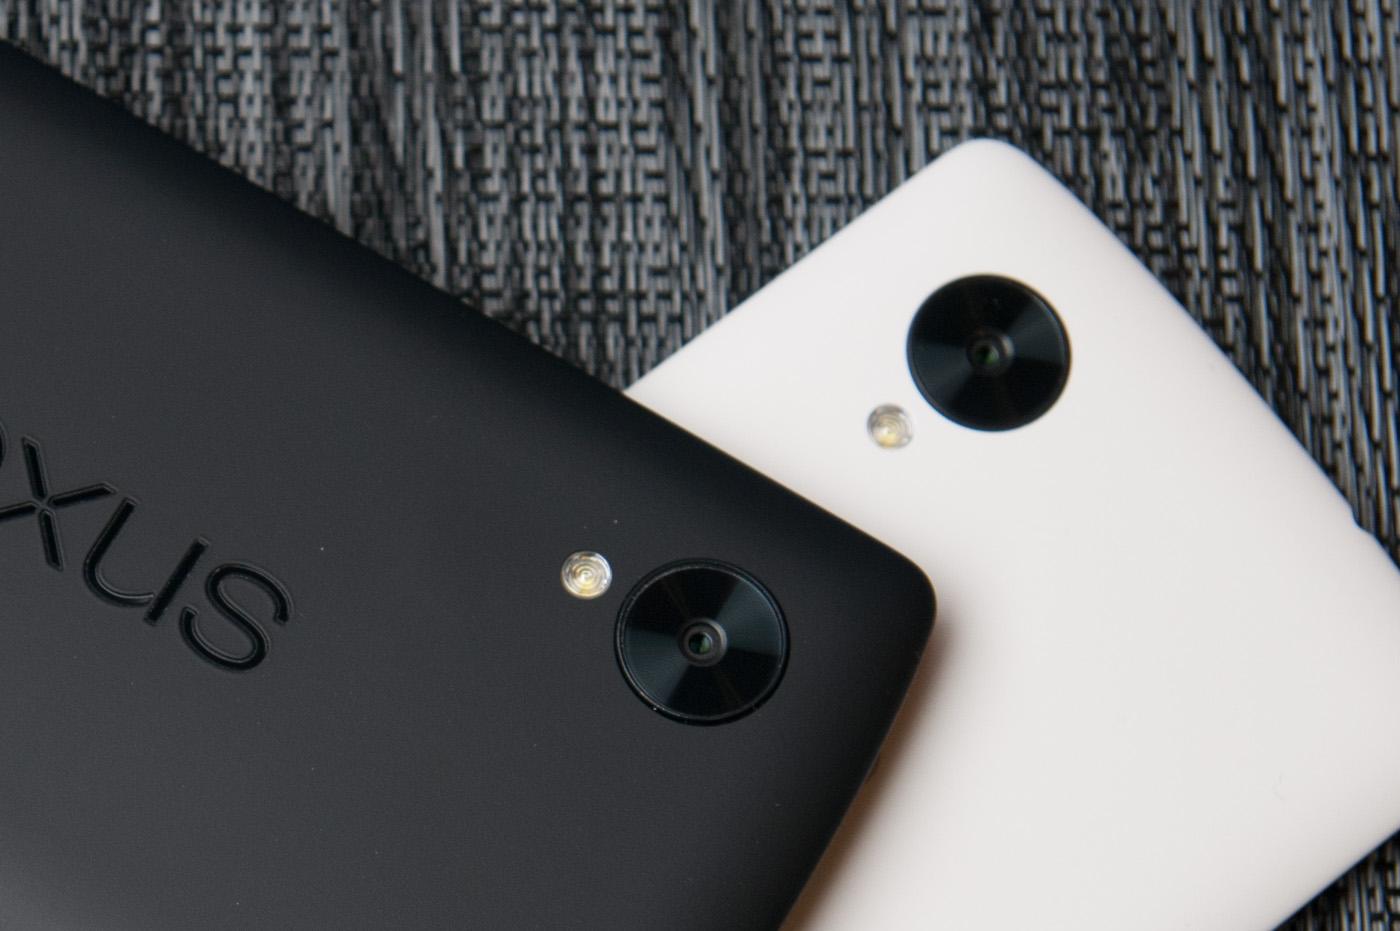 Camera Analysis - Stills and Video - Google Nexus 5 Review